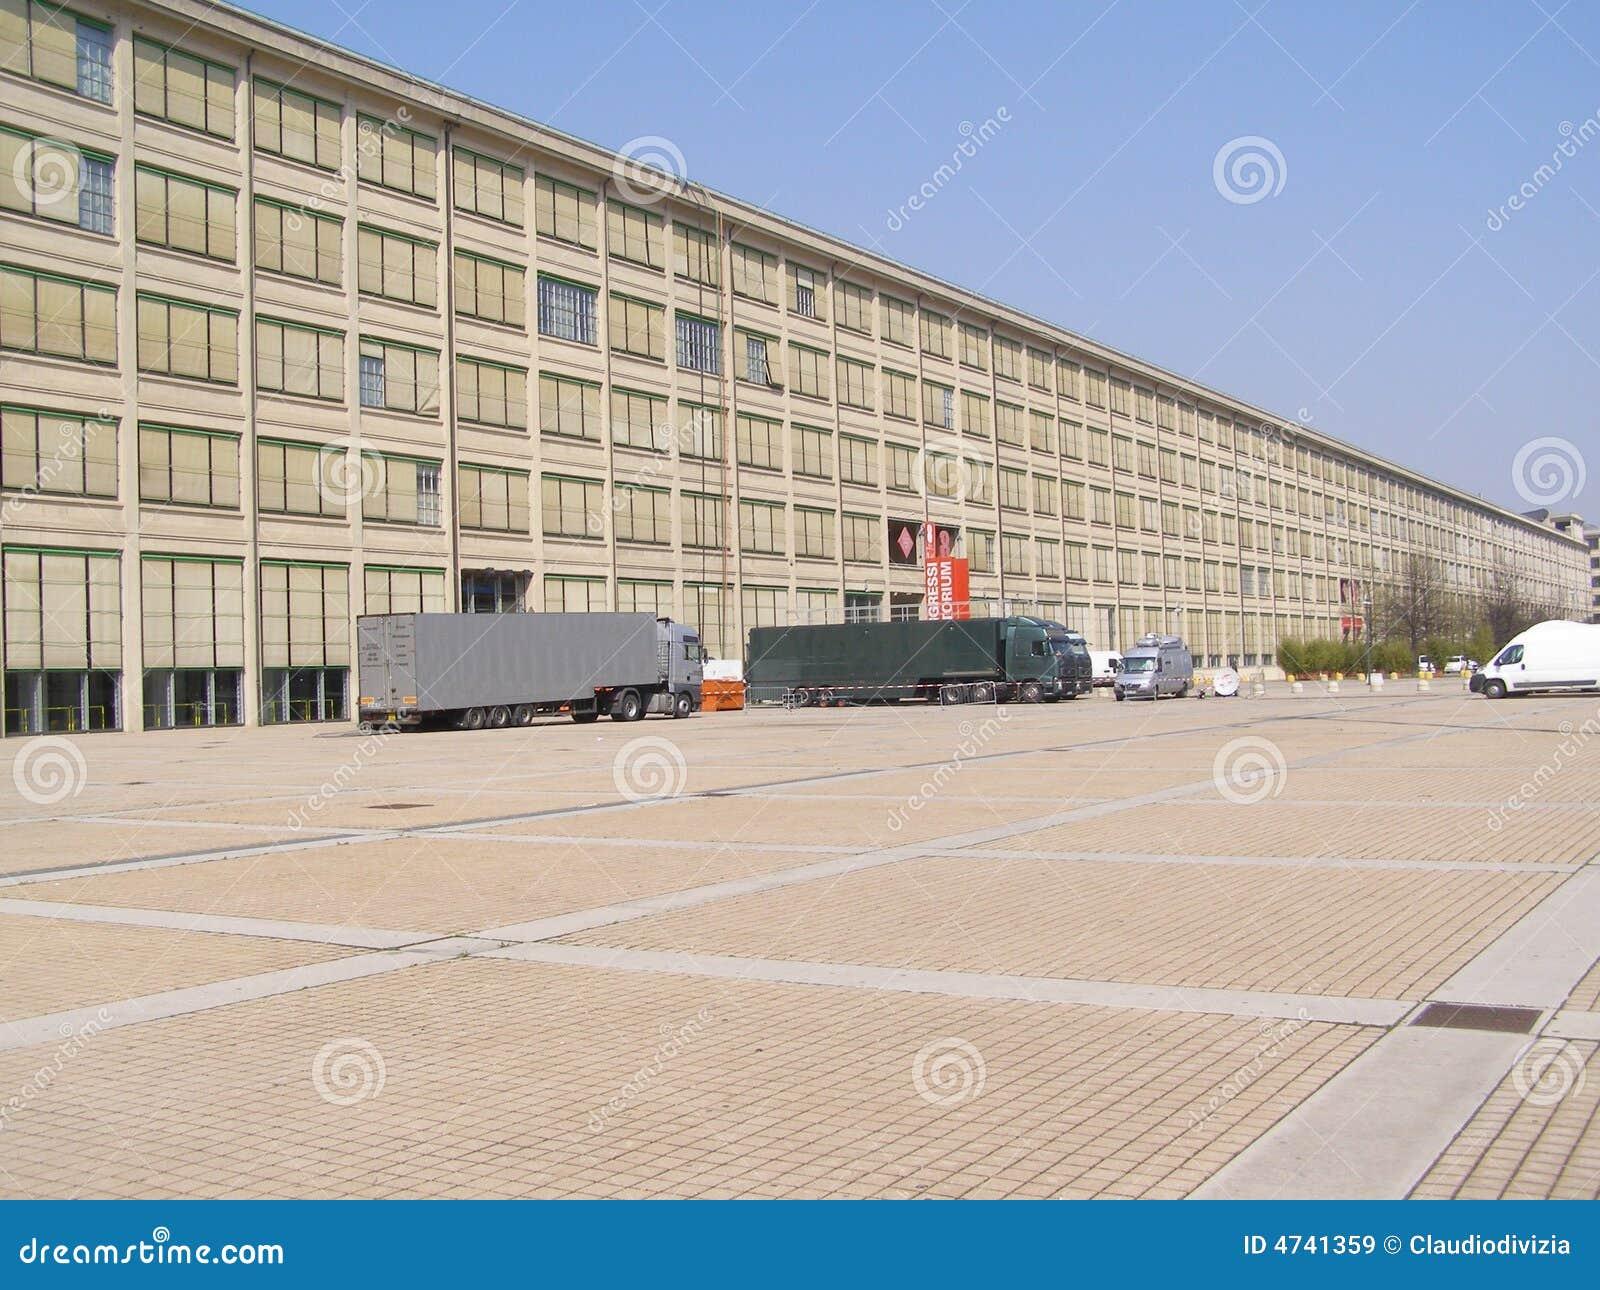 usine de fiat lingotto torino turin images libres de droits image 4741359. Black Bedroom Furniture Sets. Home Design Ideas